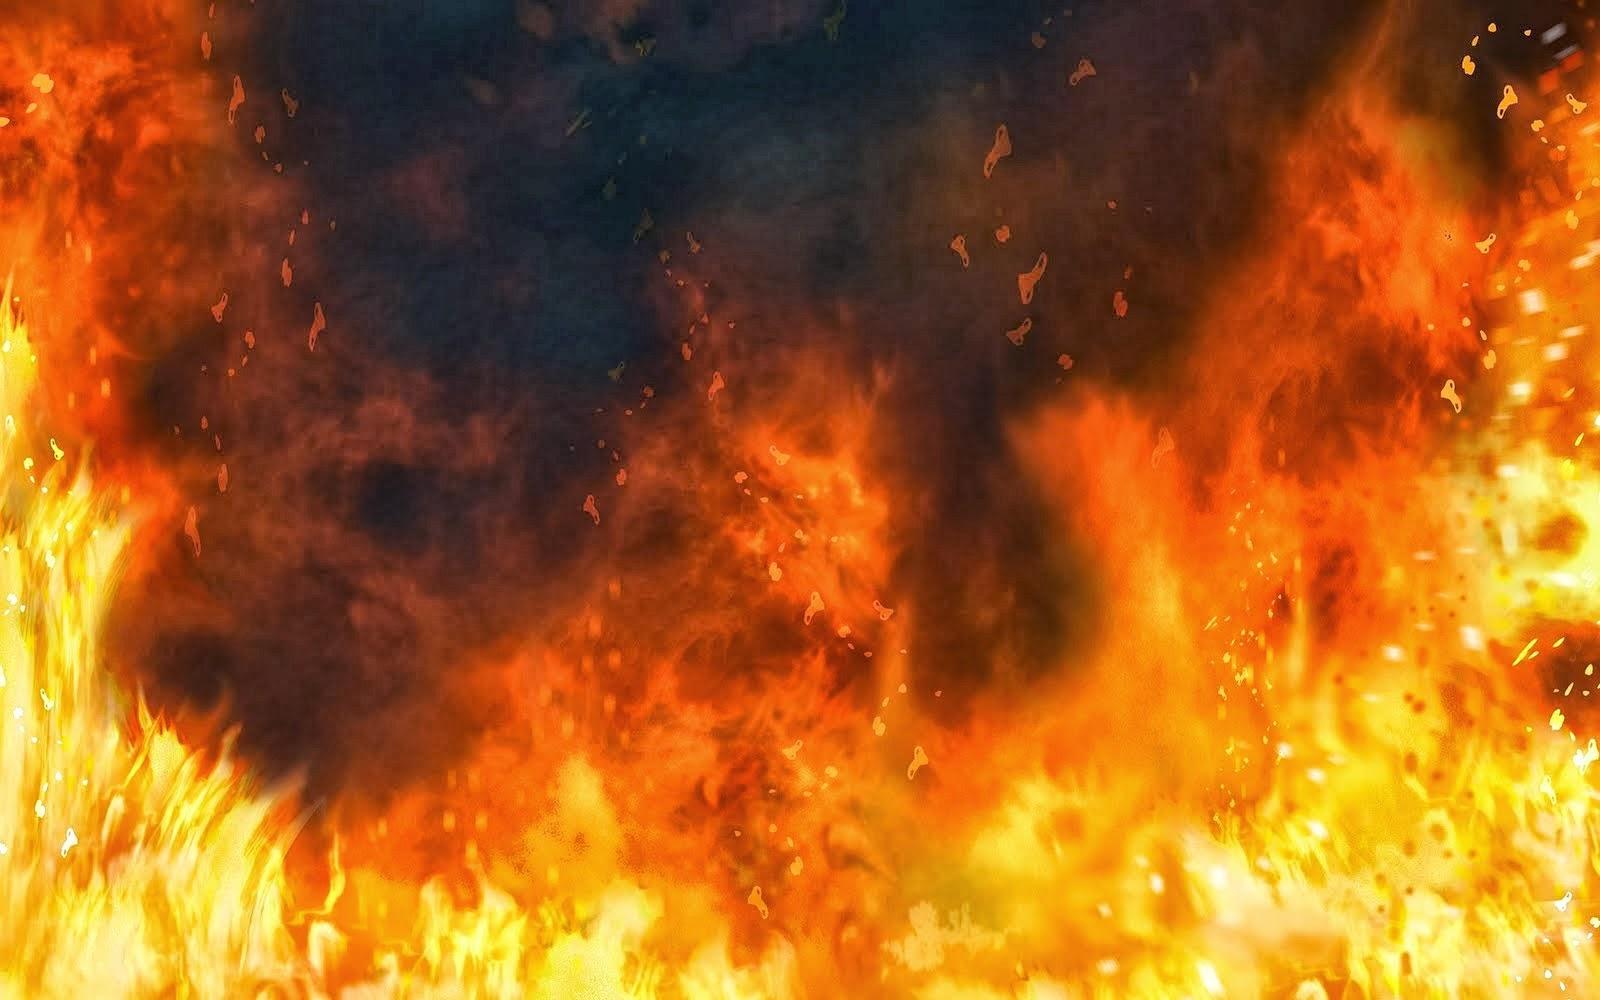 Hd Fire Wallpaper - WallpaperSafari